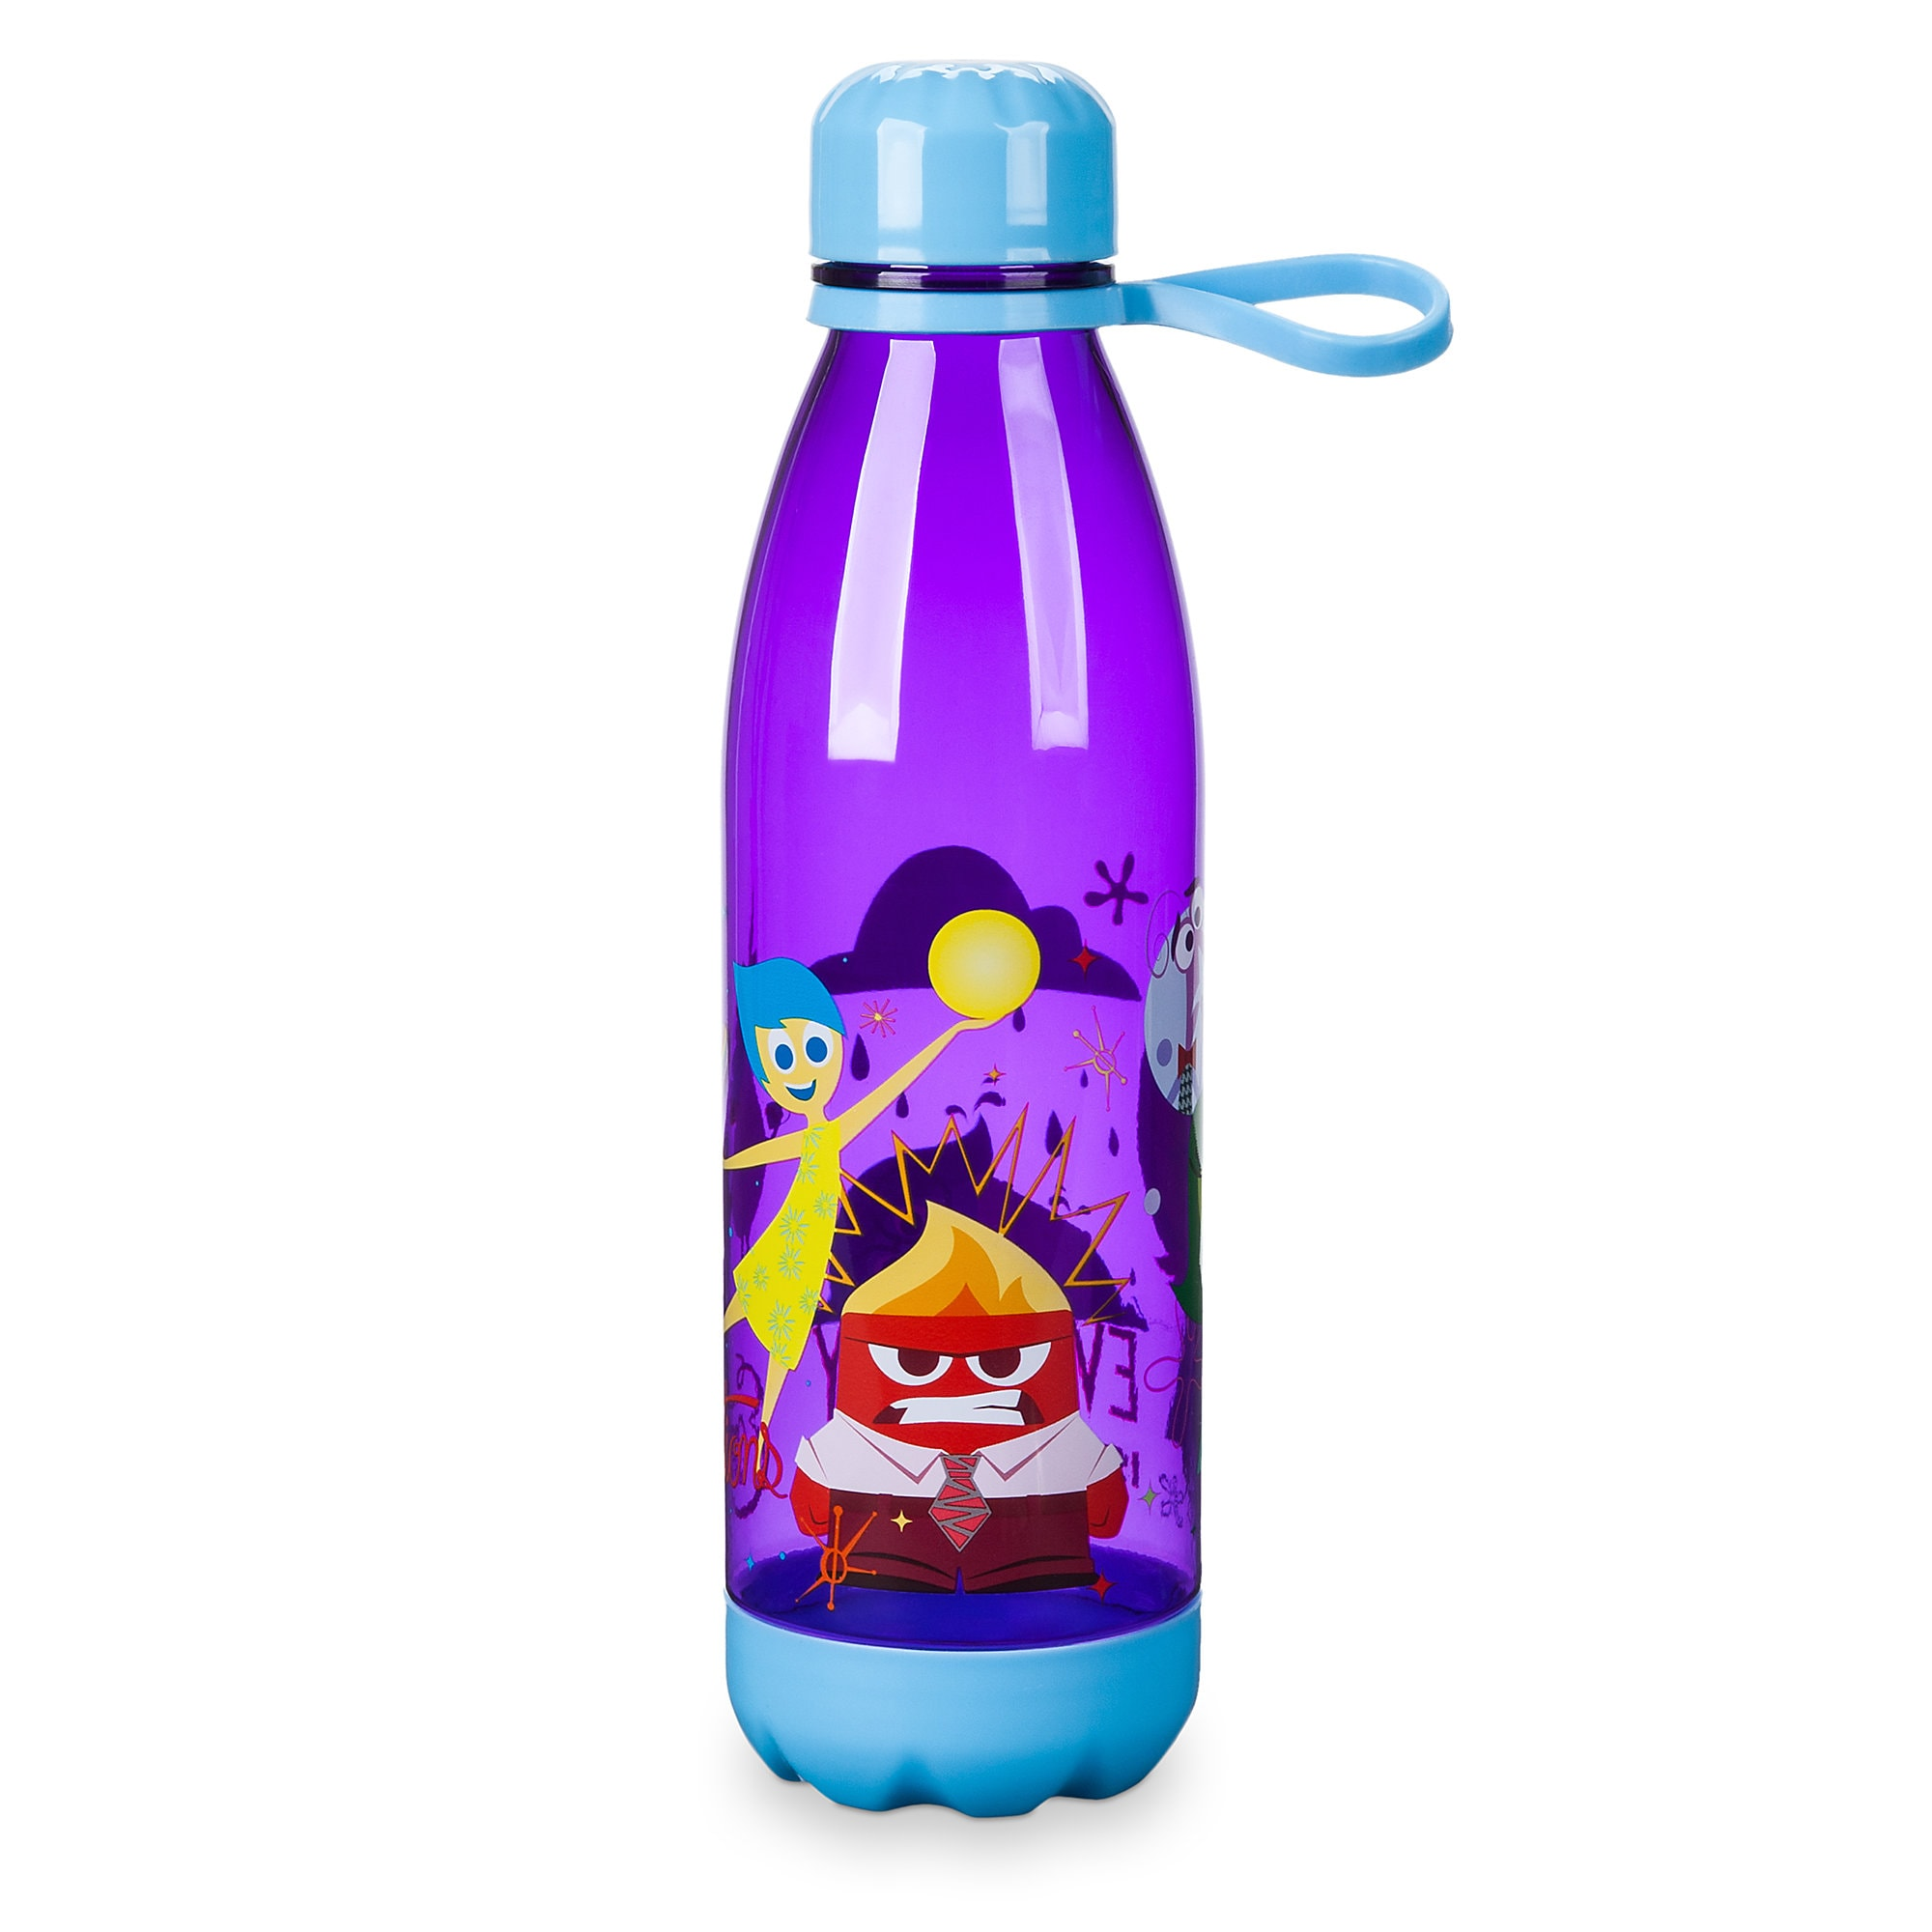 PIXAR Inside Out Water Bottle